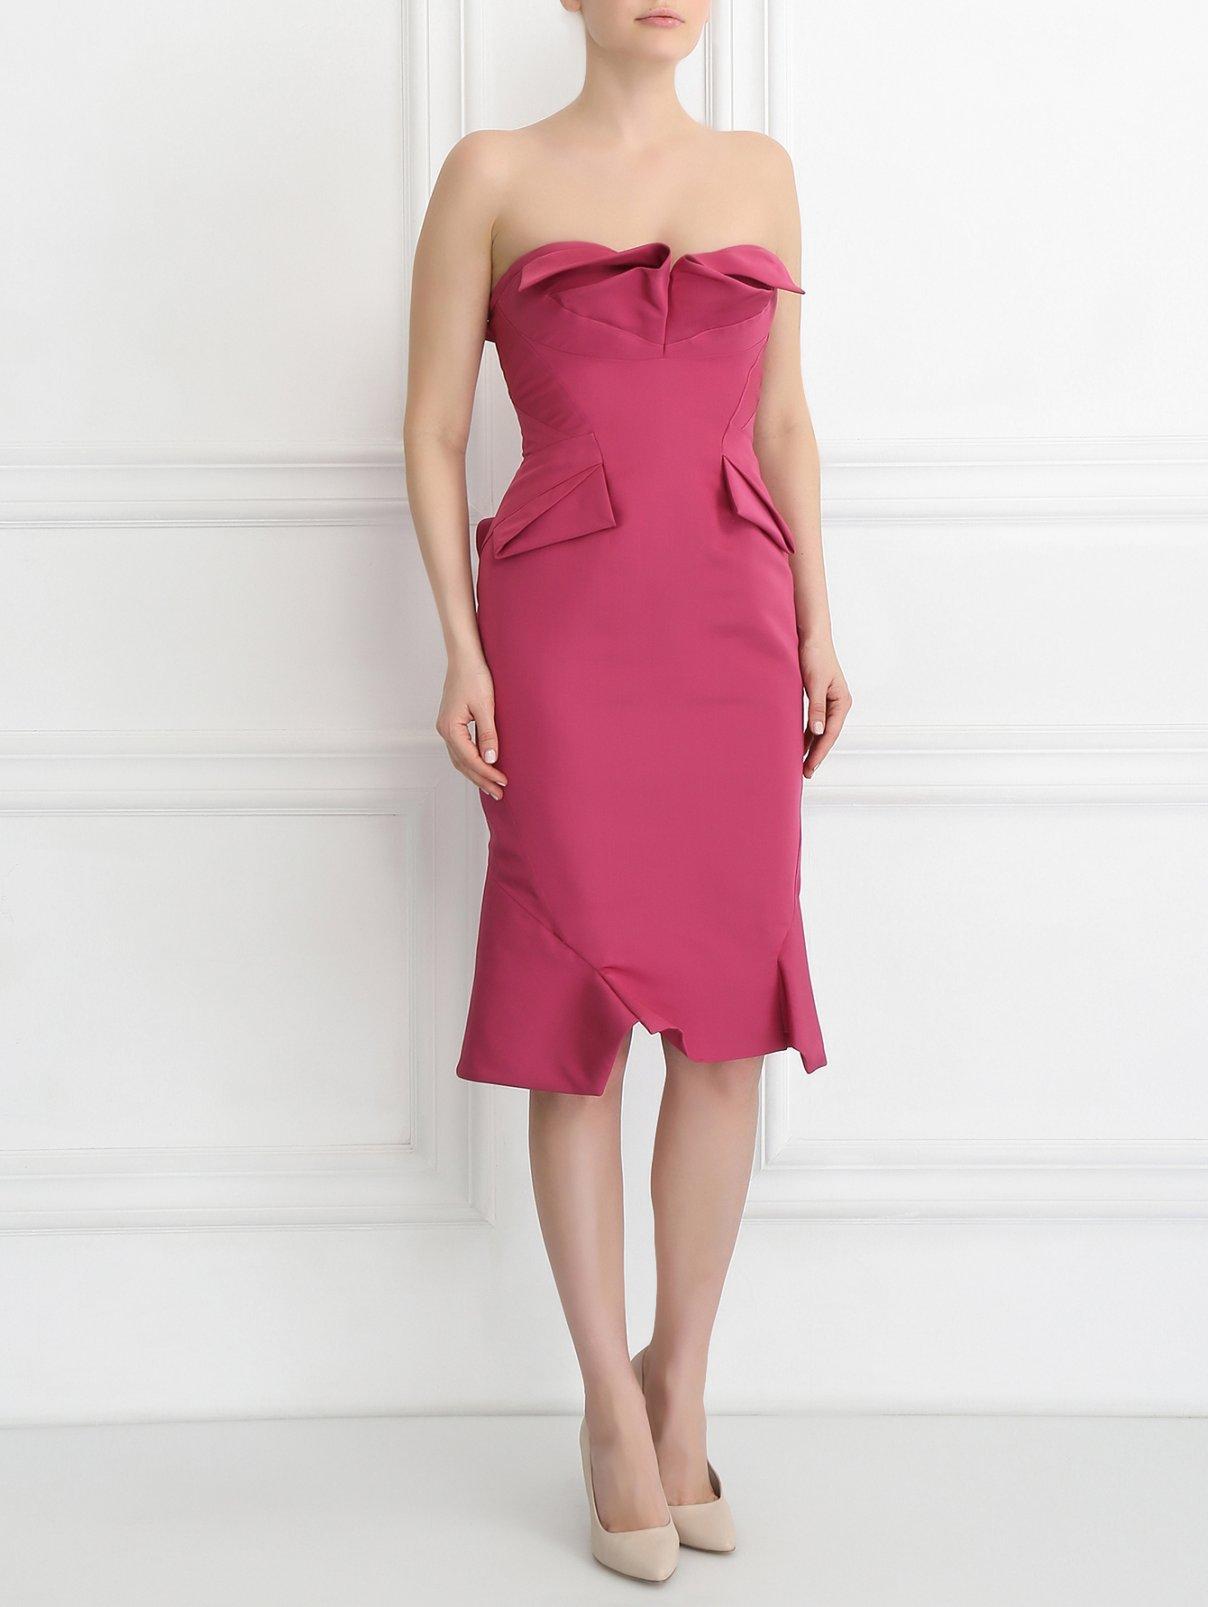 Платье-футляр из шелка без рукавов Zac Posen  –  Модель Общий вид